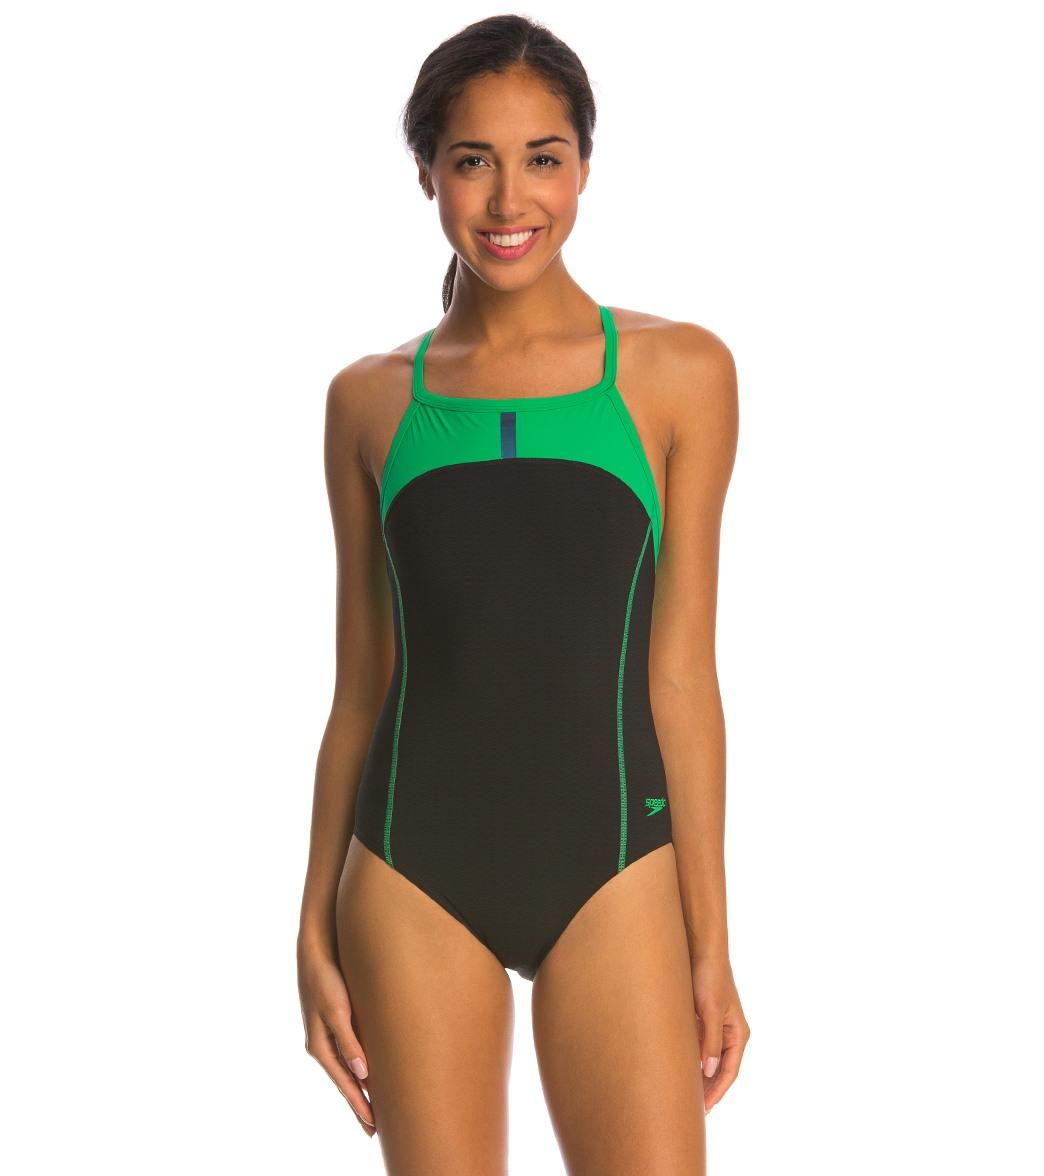 Speedo Bolt Splice Drill Back Powerplus Onepiece Swimsuit Speedo Swimwear 7719703-P